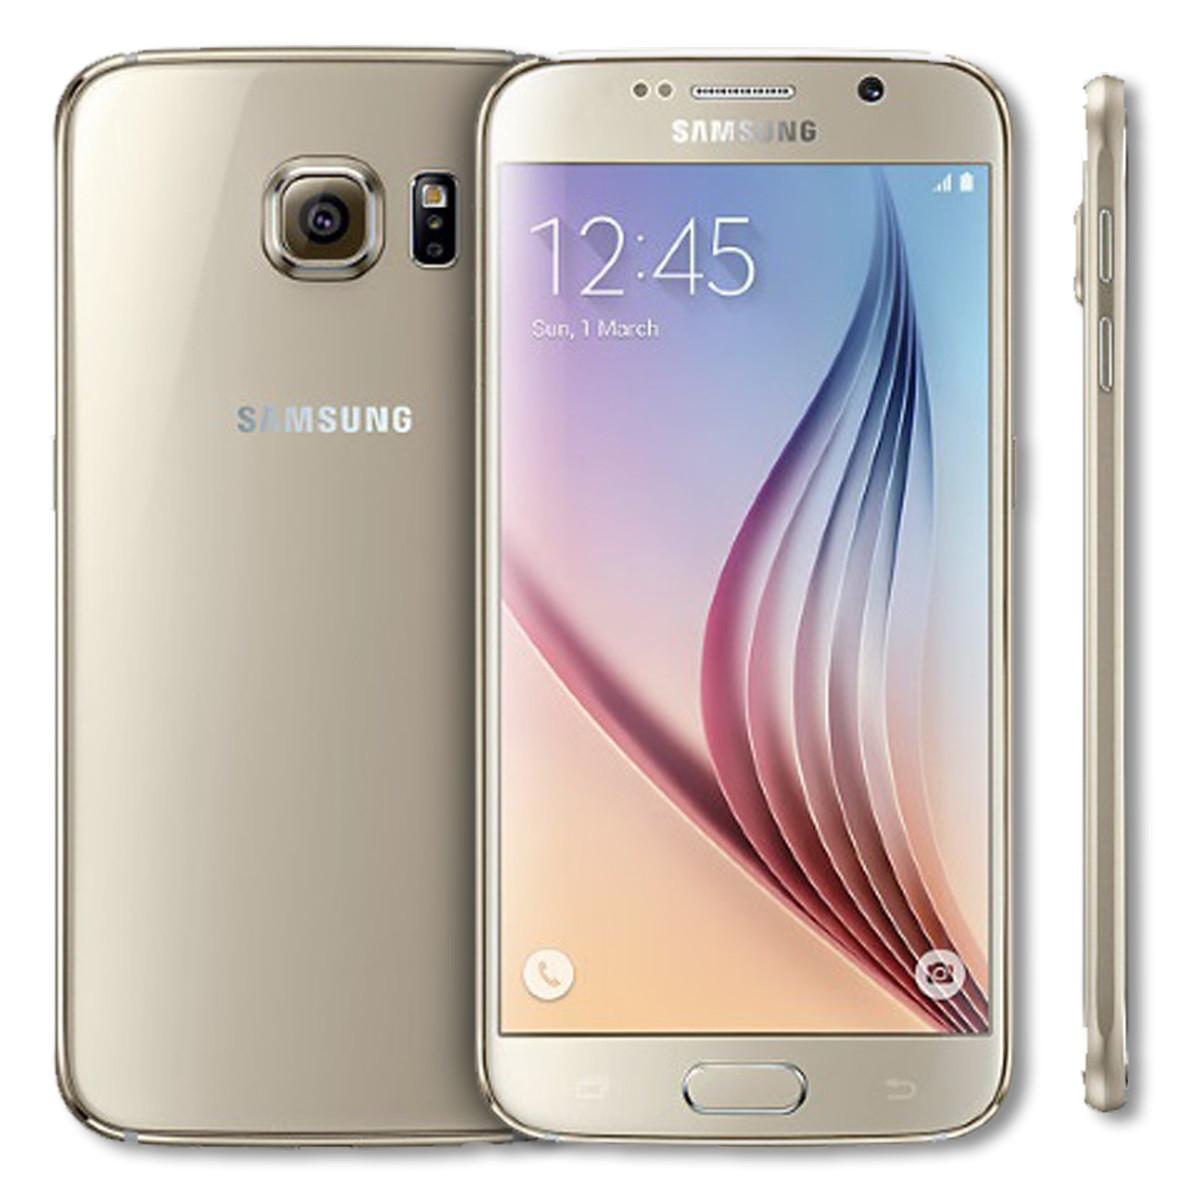 "Смартфон Samsung Galaxy S6 SM-G920P 3/32GB CDMA/GSM Gold, 16/5Мп, 5.1"" AMOLED, 1sim, 4G (LTE), 2550mAh"